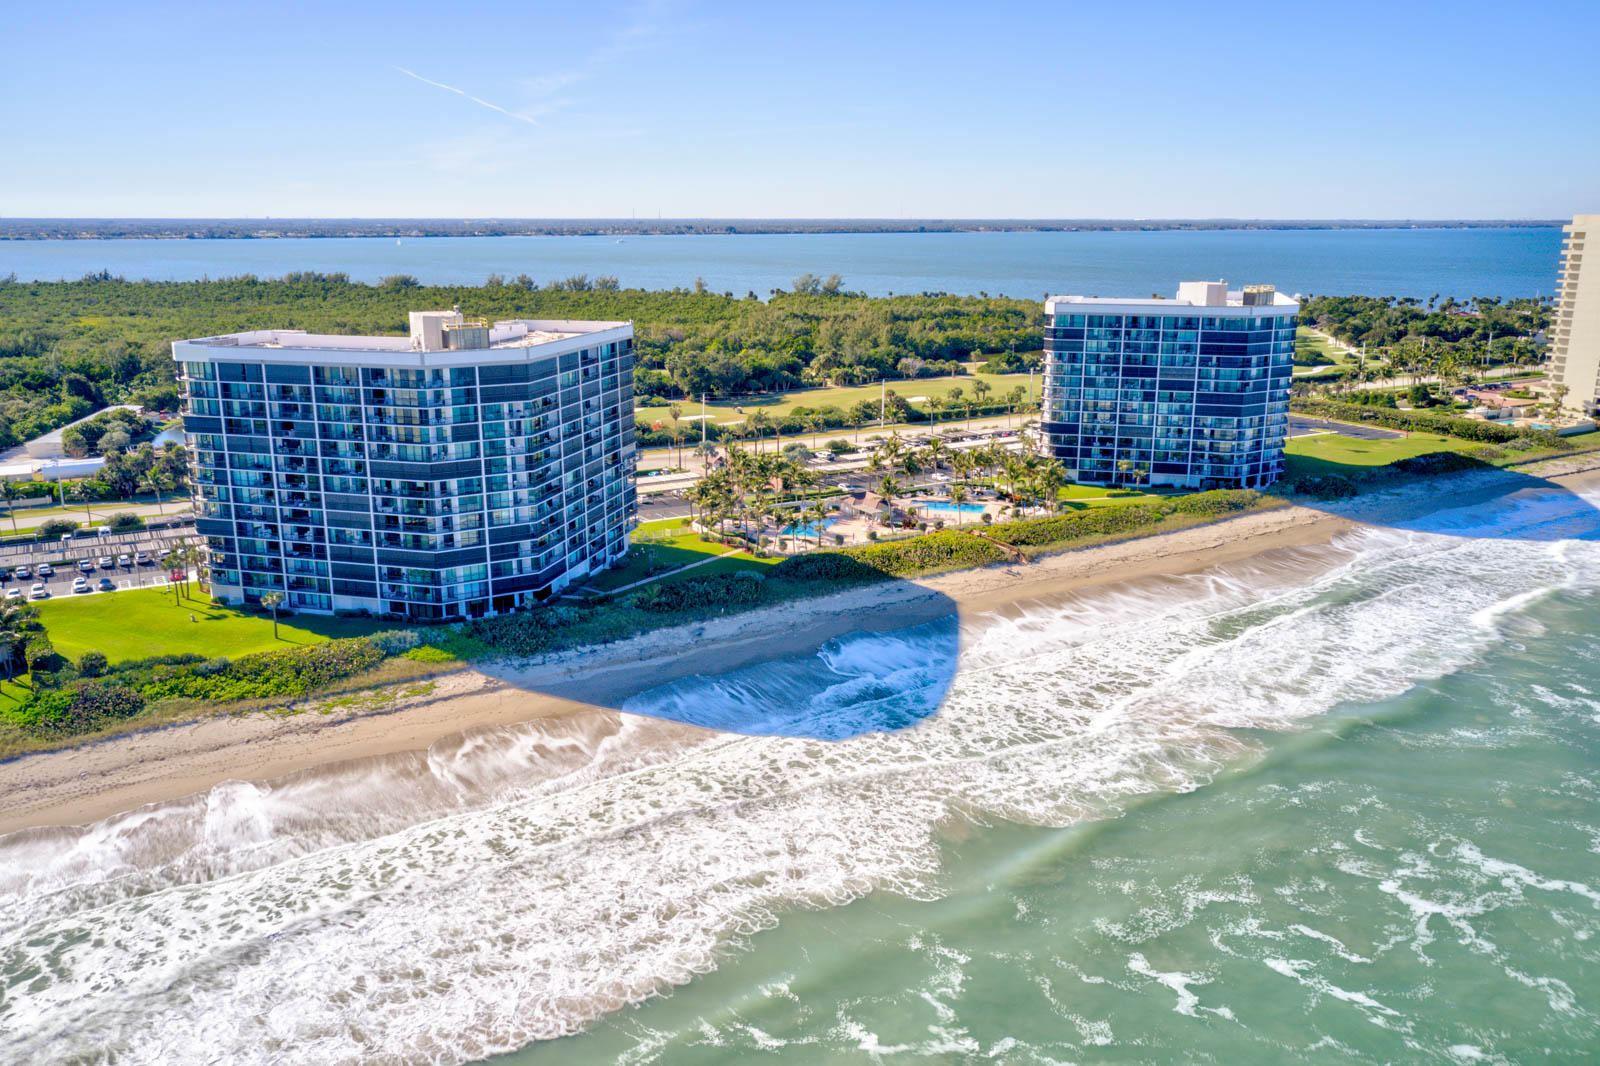 Photo of 8800 S Ocean Drive #407, Jensen Beach, FL 34957 (MLS # RX-10692546)